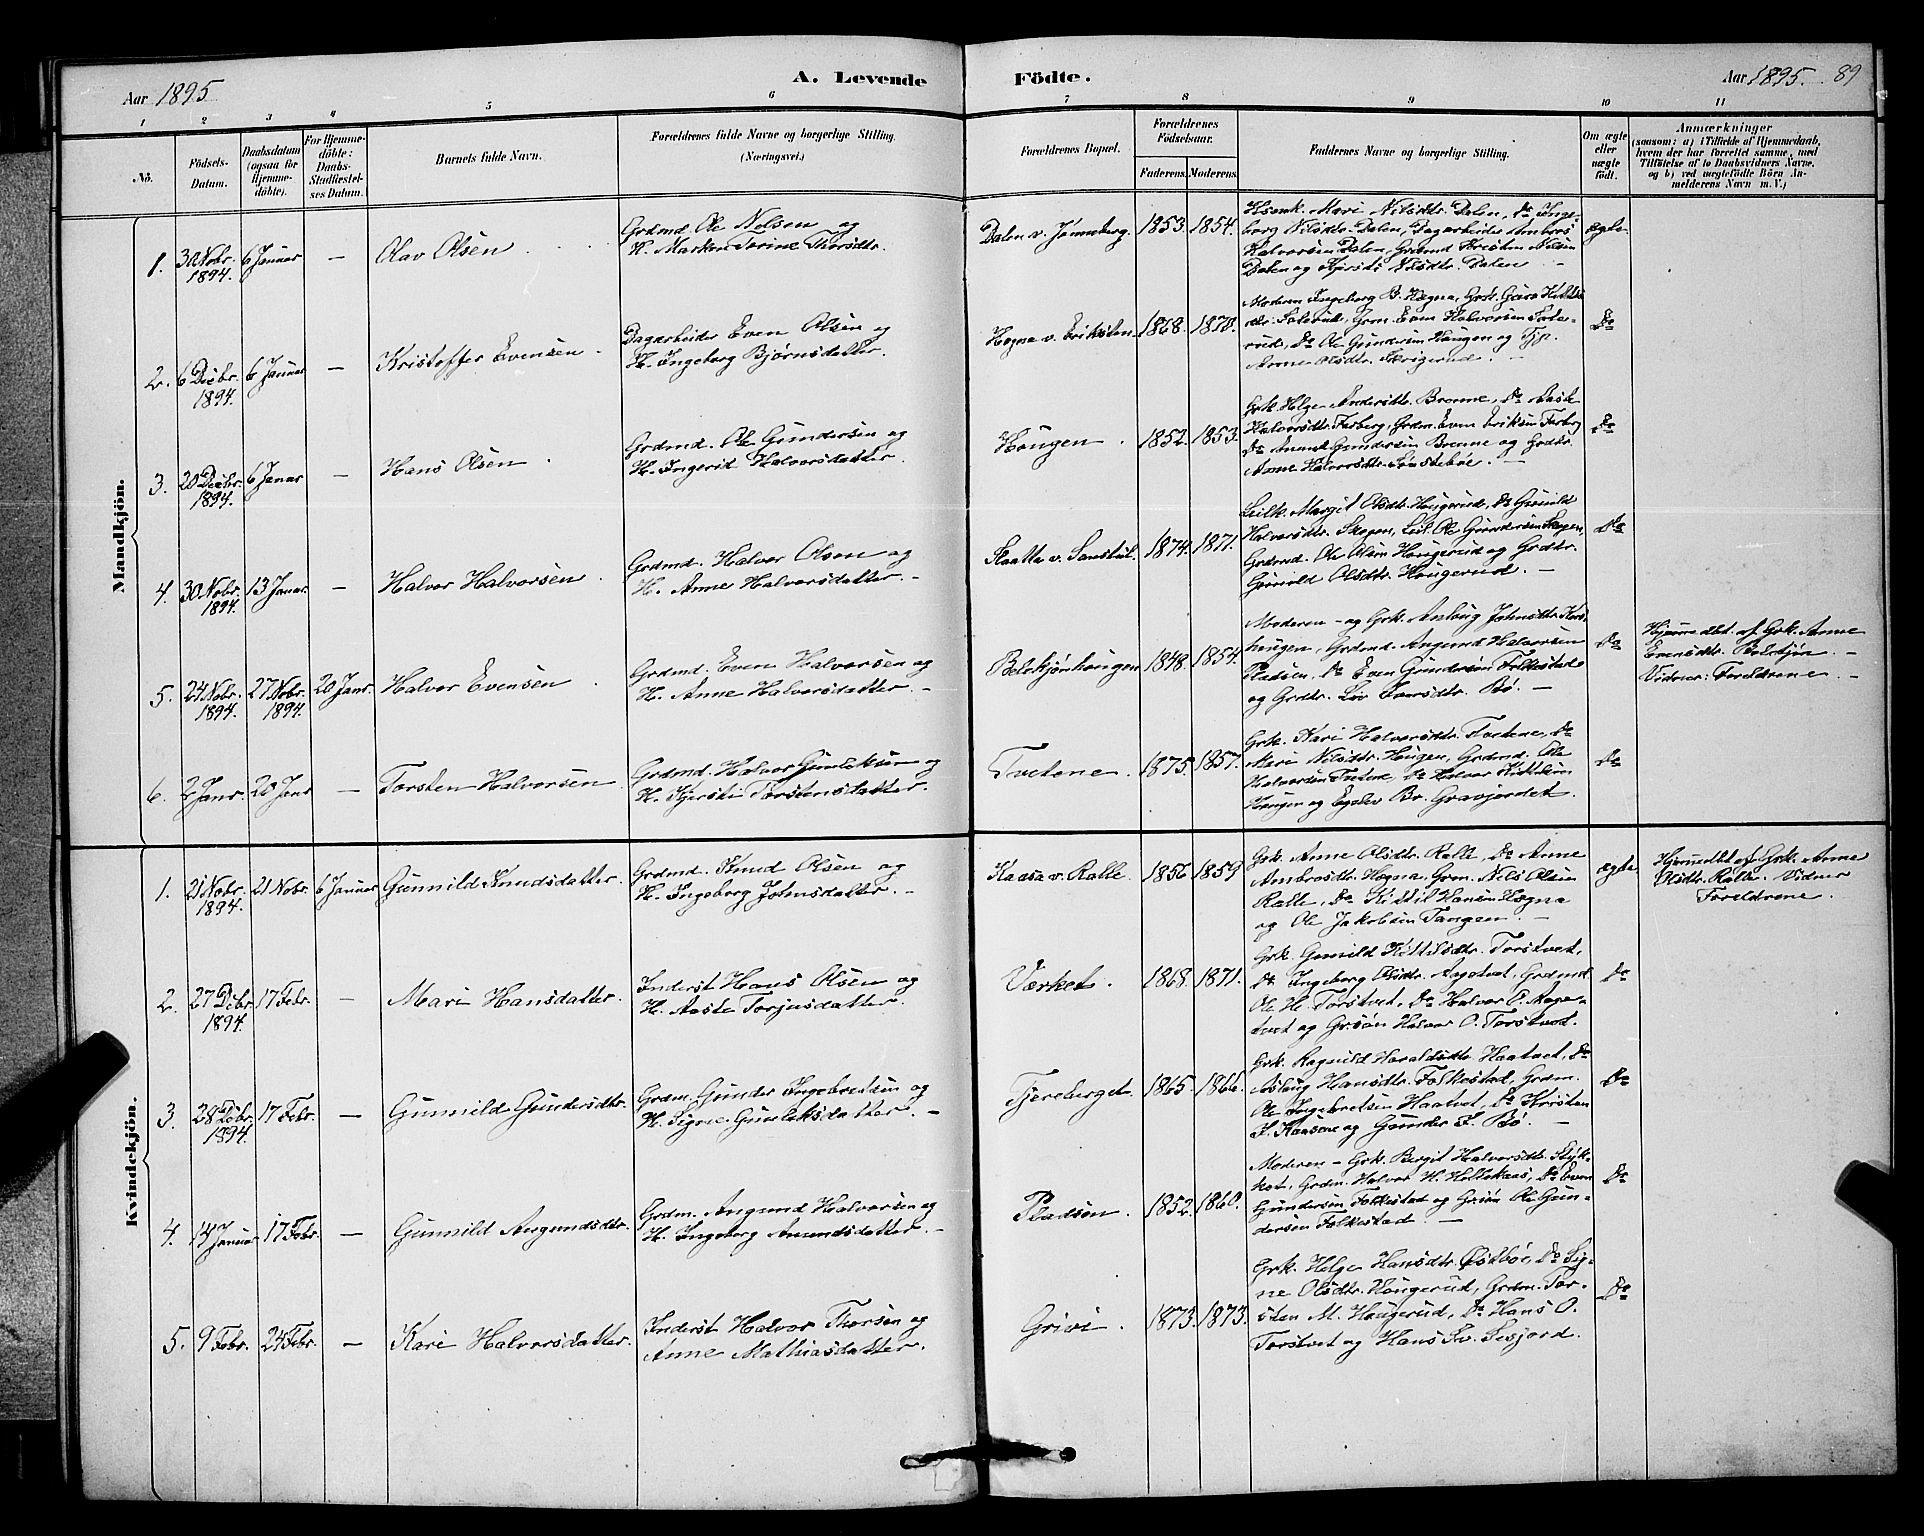 SAKO, Bø kirkebøker, G/Ga/L0005: Klokkerbok nr. 5, 1883-1897, s. 89